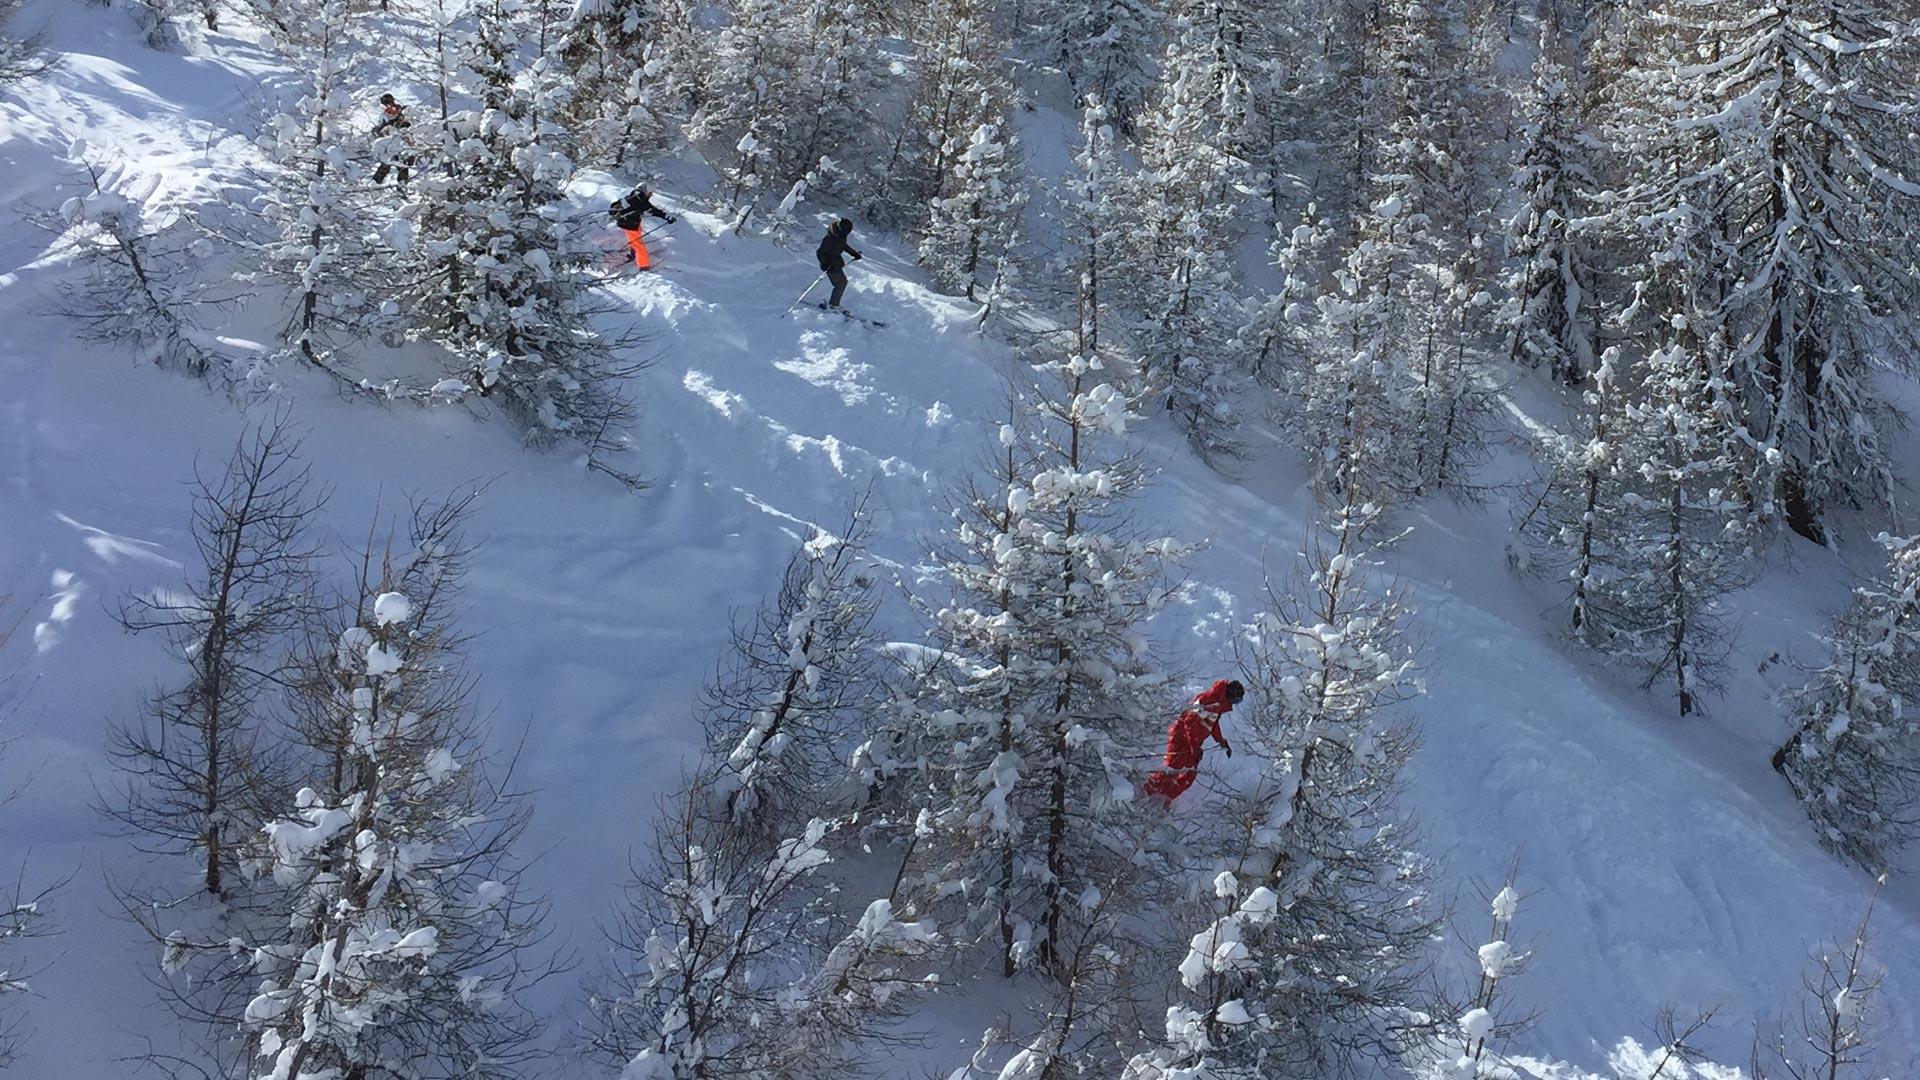 Ski guiding between trees, Sainte Foy